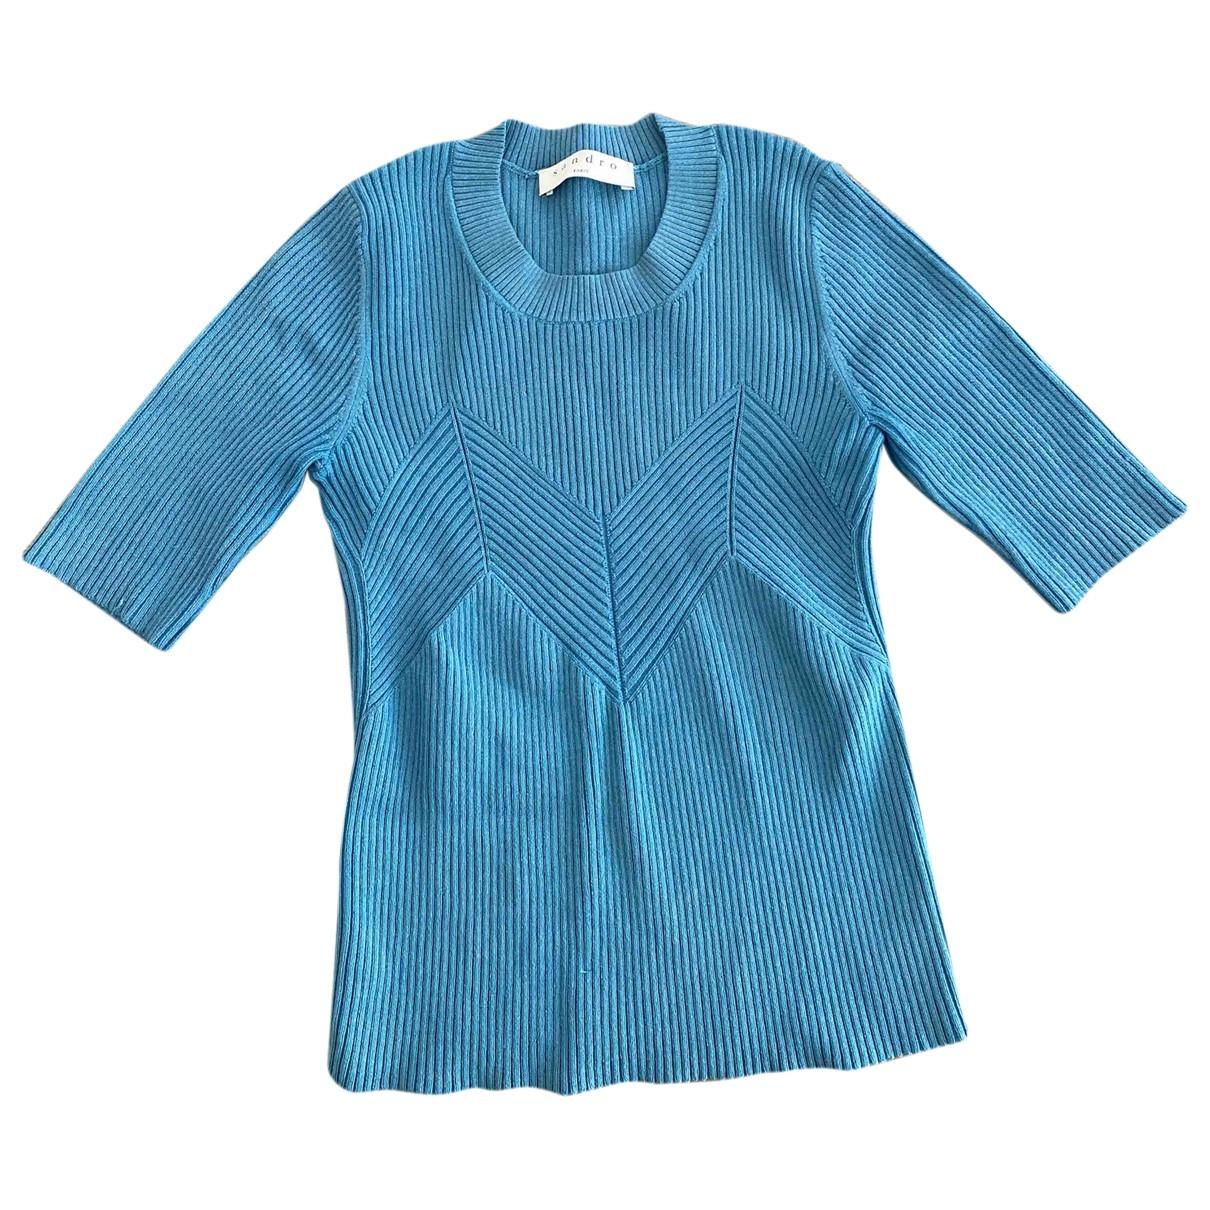 Sandro - Top   pour femme - bleu